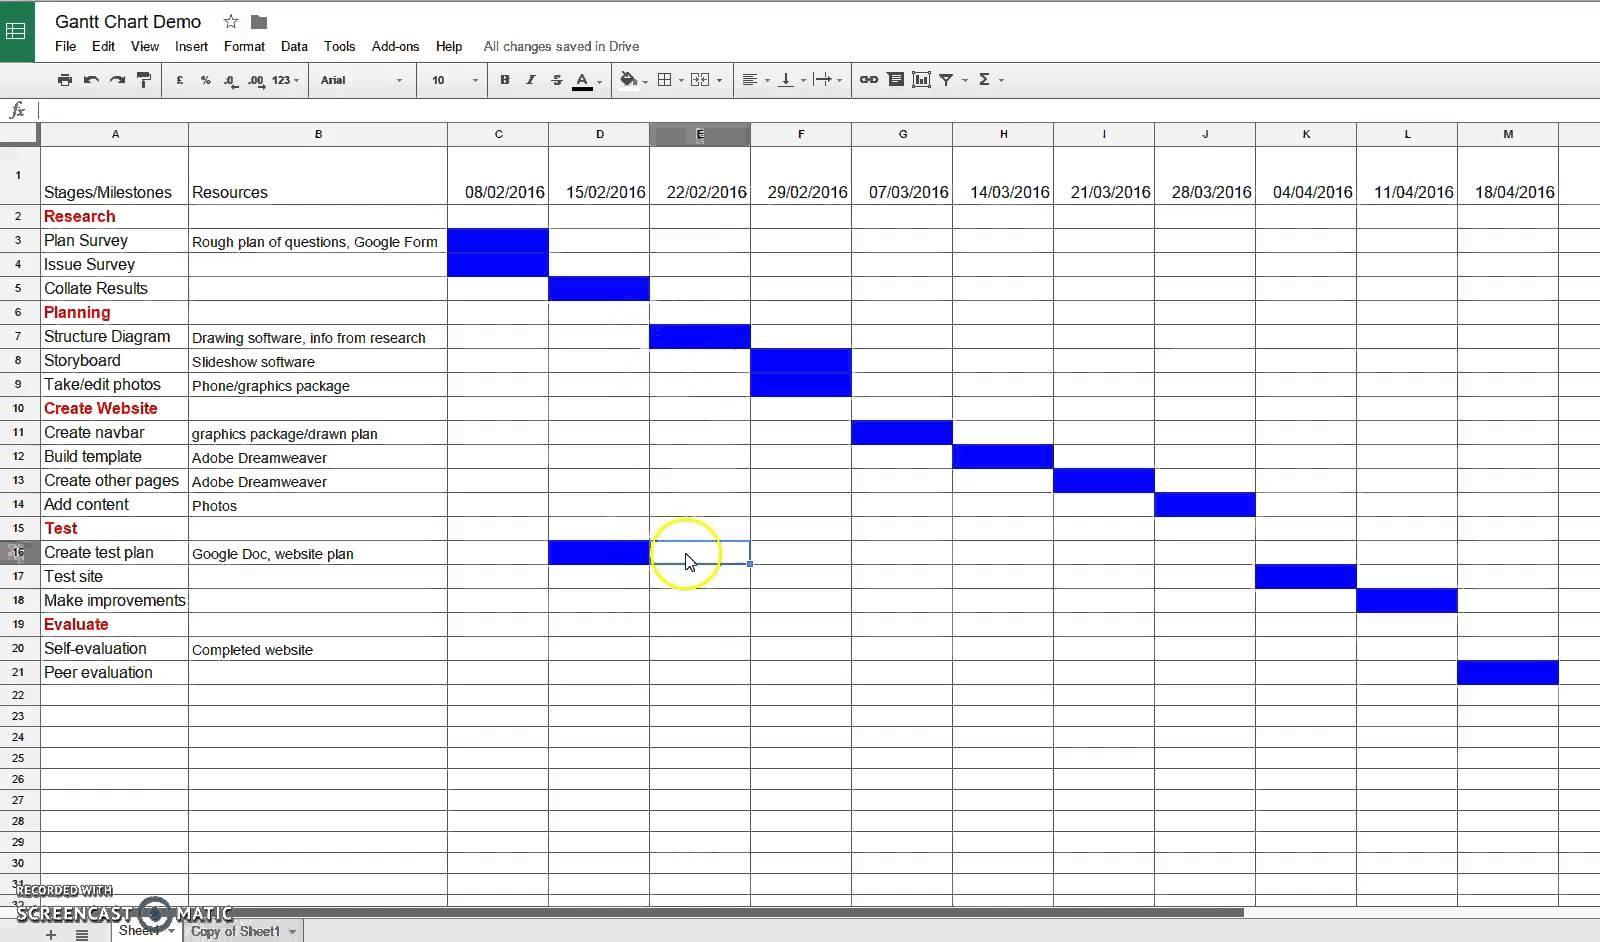 marketing calendar template google sheets  Comment faire un gantt - marketing calendar template google sheets